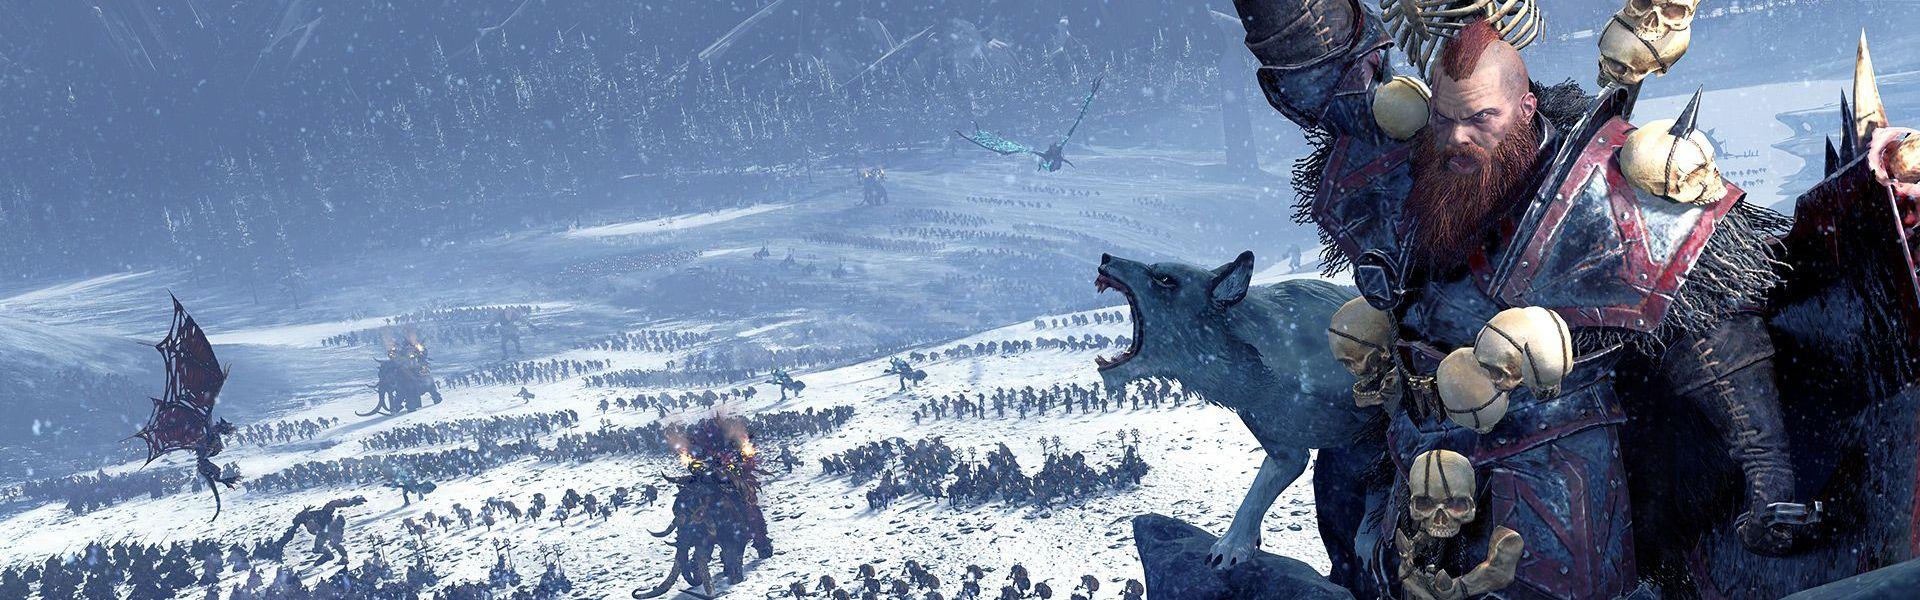 Total War: Warhammer - Norsca (DLC) Steam Key EUROPE